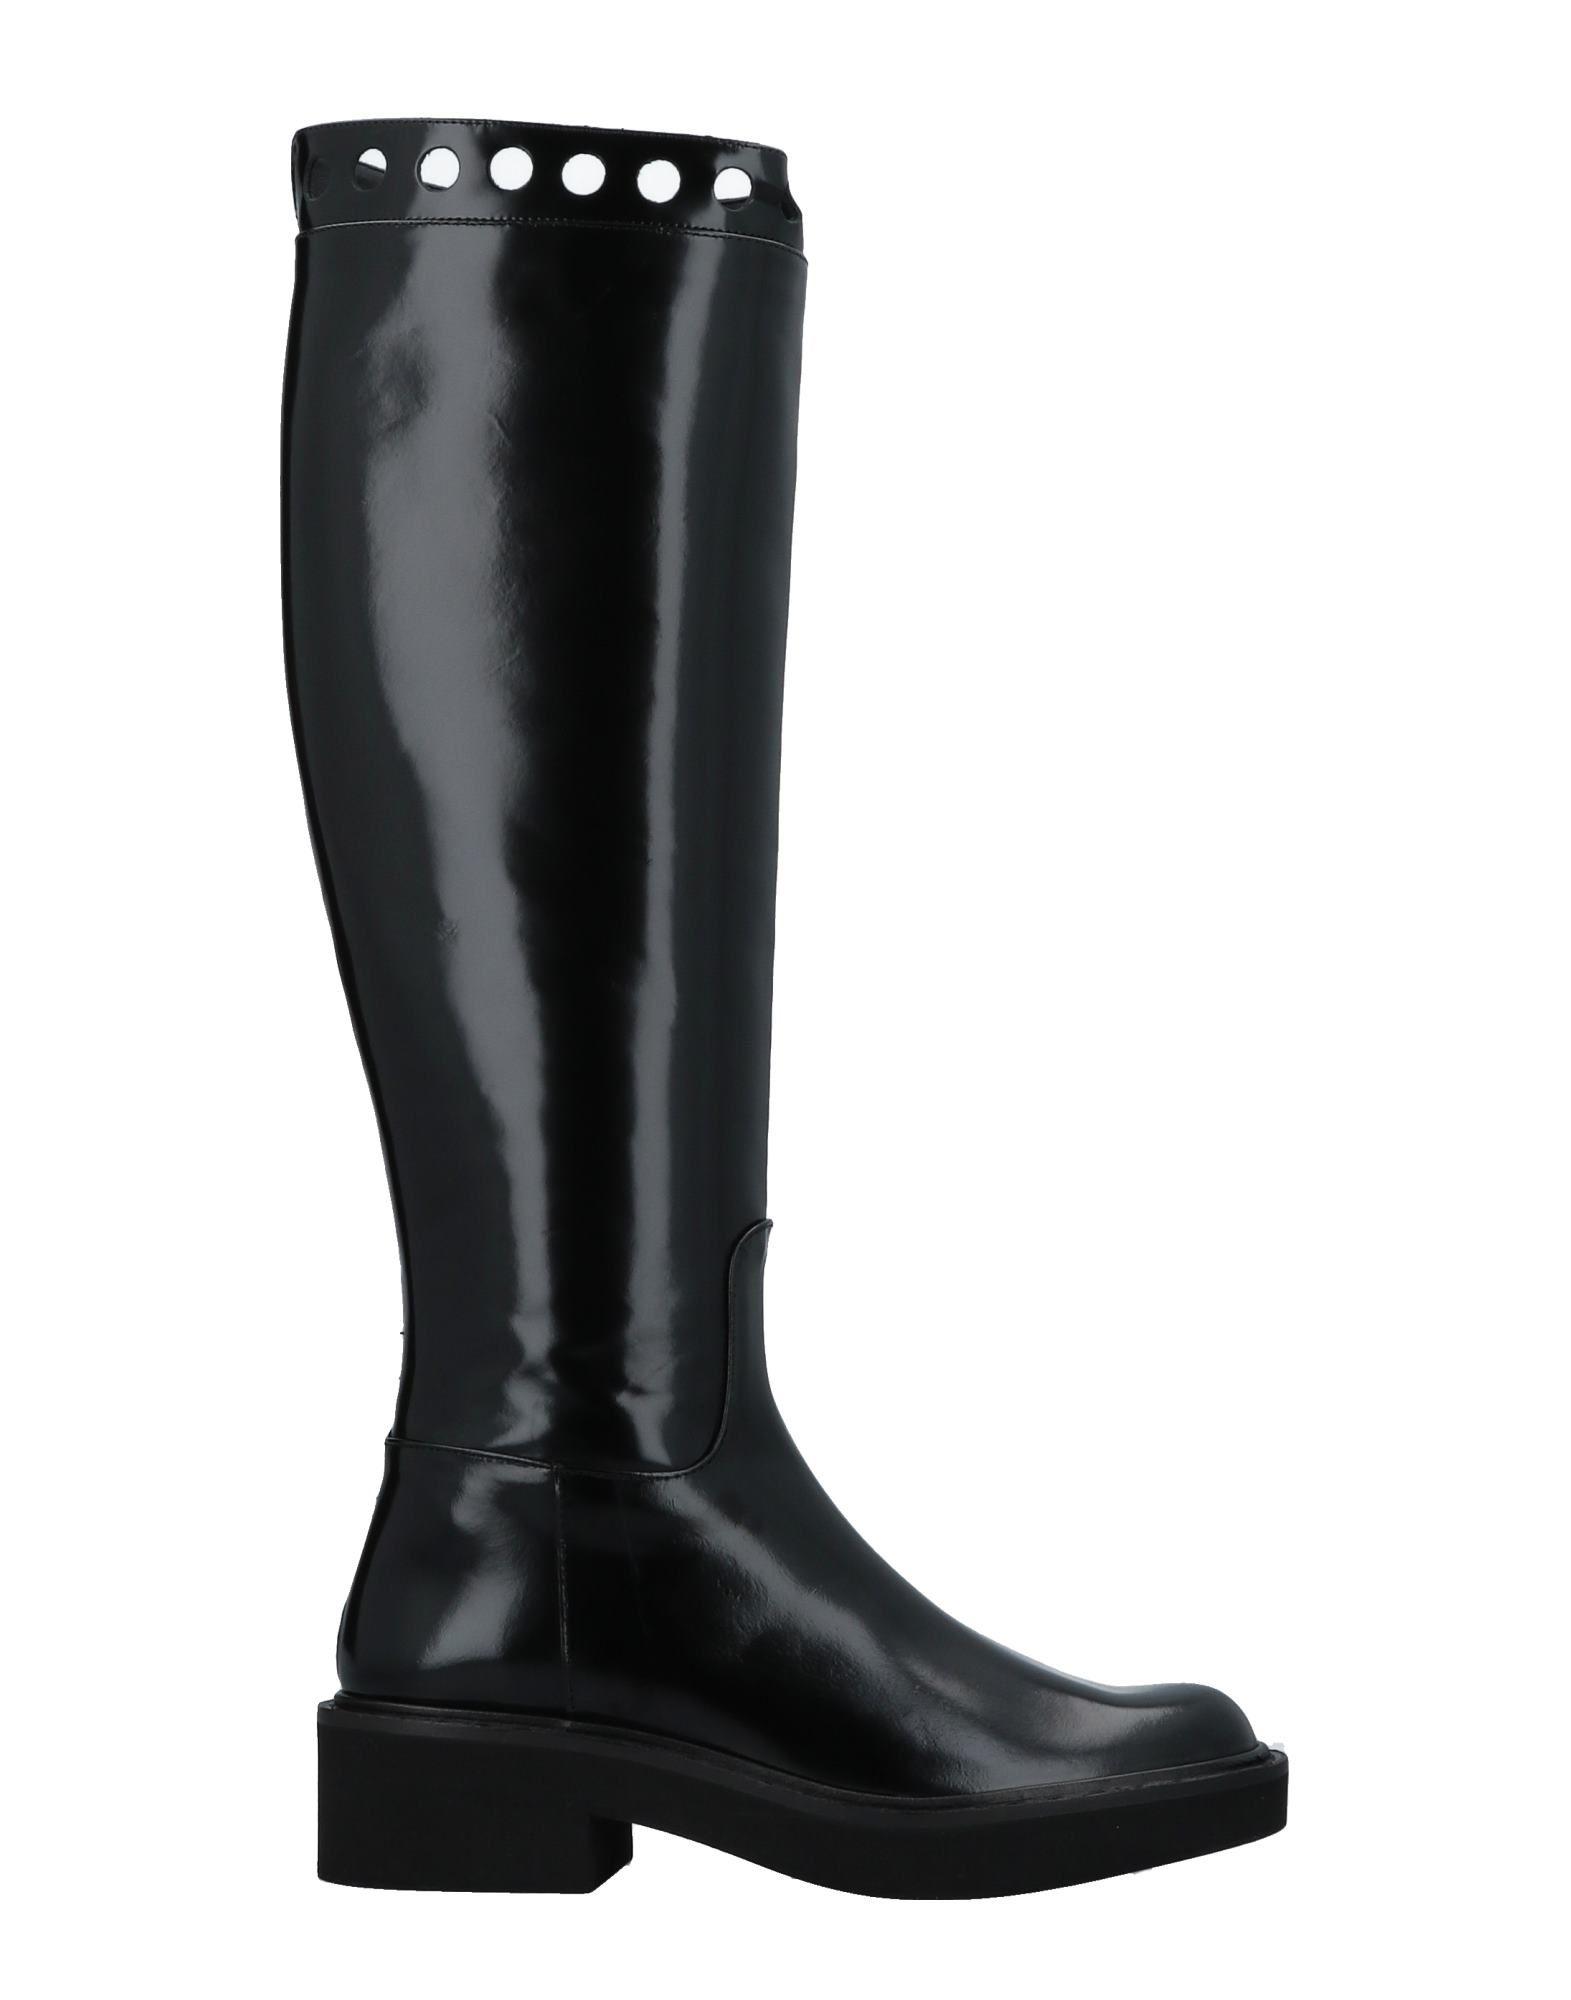 Paloma Barceló Stiefel Damen  11511701PWGut aussehende strapazierfähige strapazierfähige strapazierfähige Schuhe a51e10